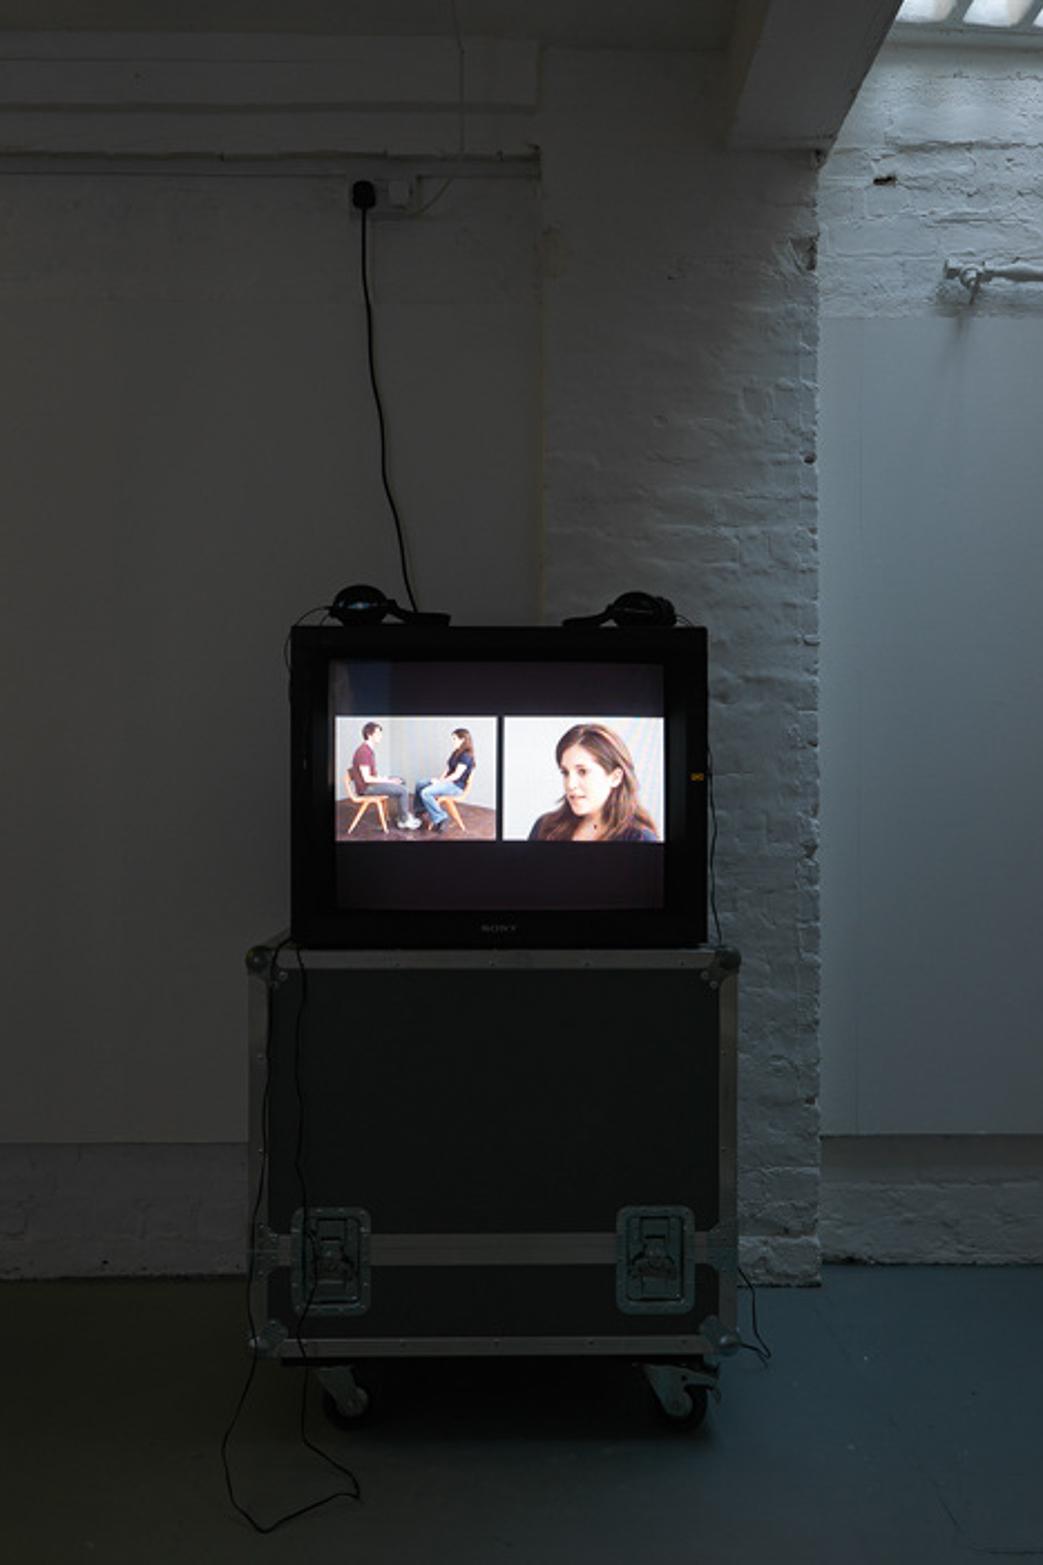 Anja Kirschner and David Panos, Living Truthfully Under Imaginary Circumstances.